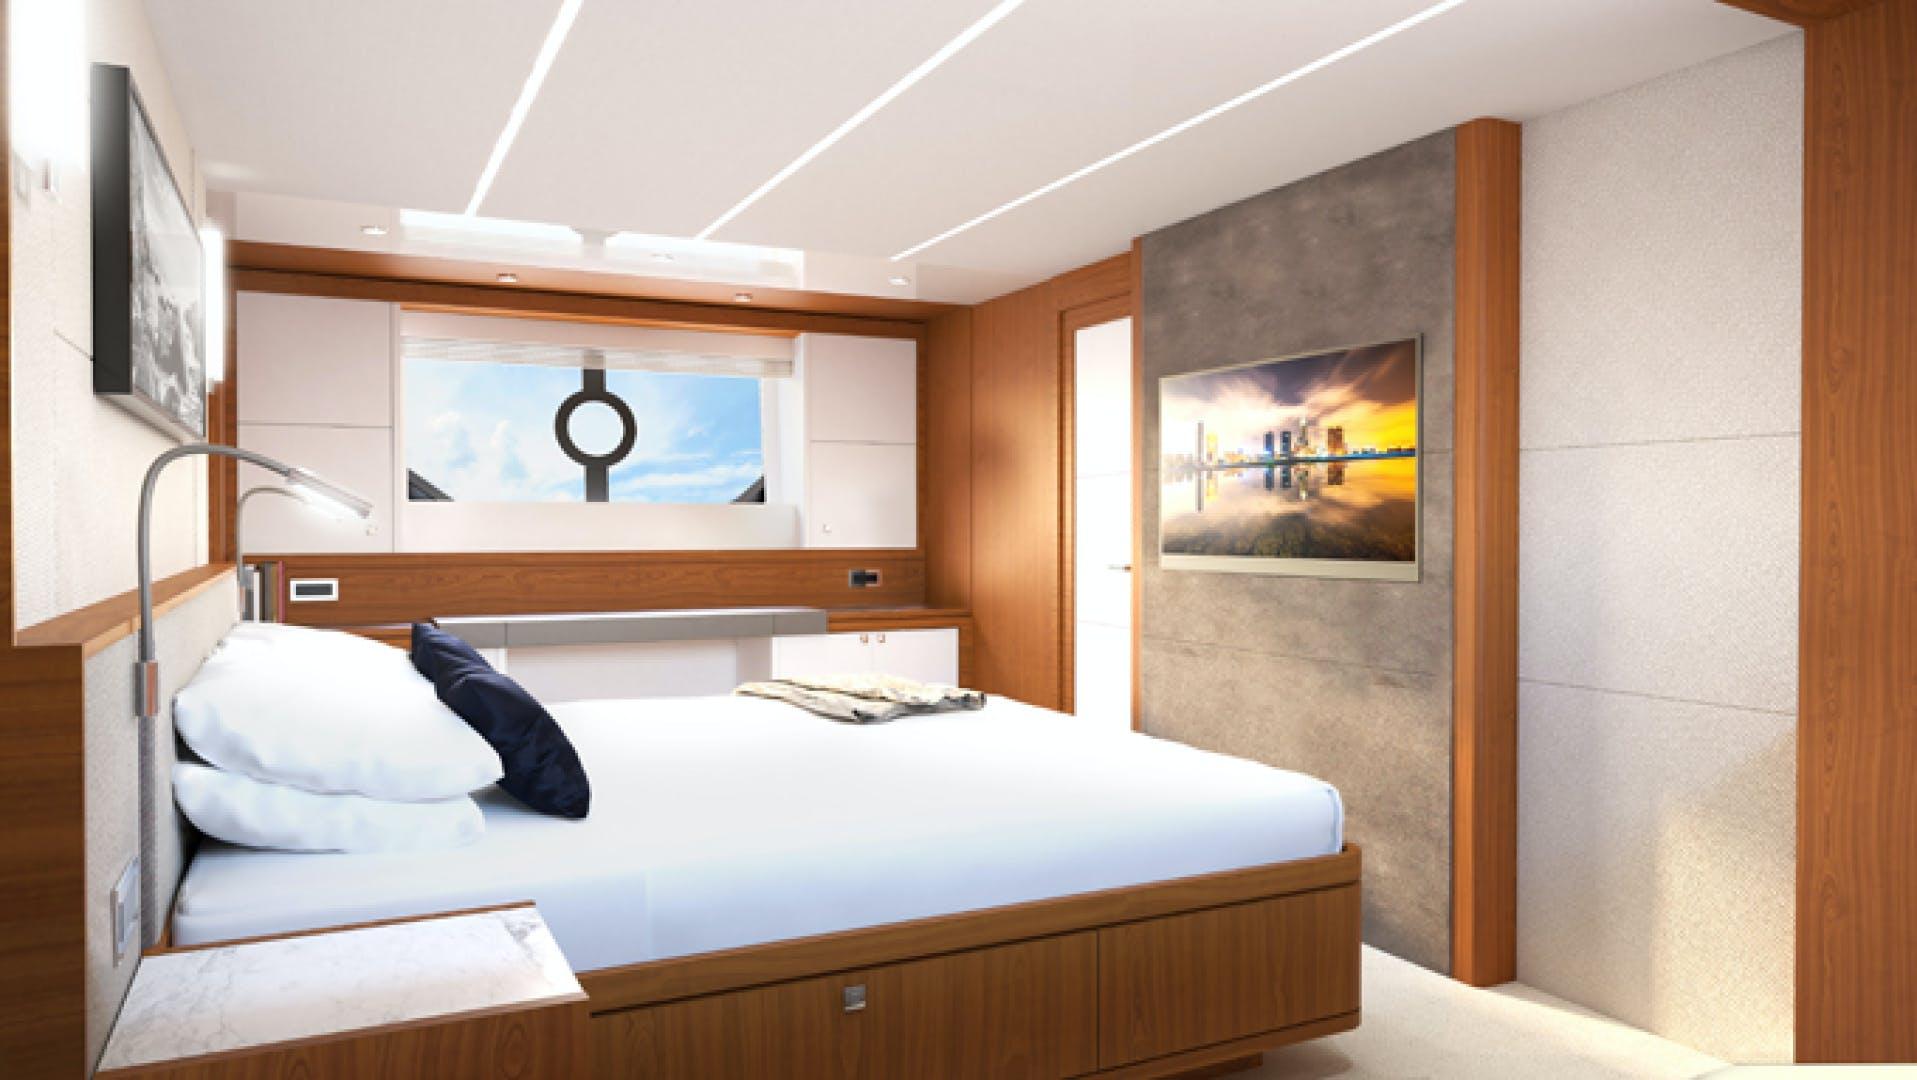 2022 Johnson 70' Flybridge Motor Yacht JOHNSON 70 FLYBRIDGE | Picture 5 of 11